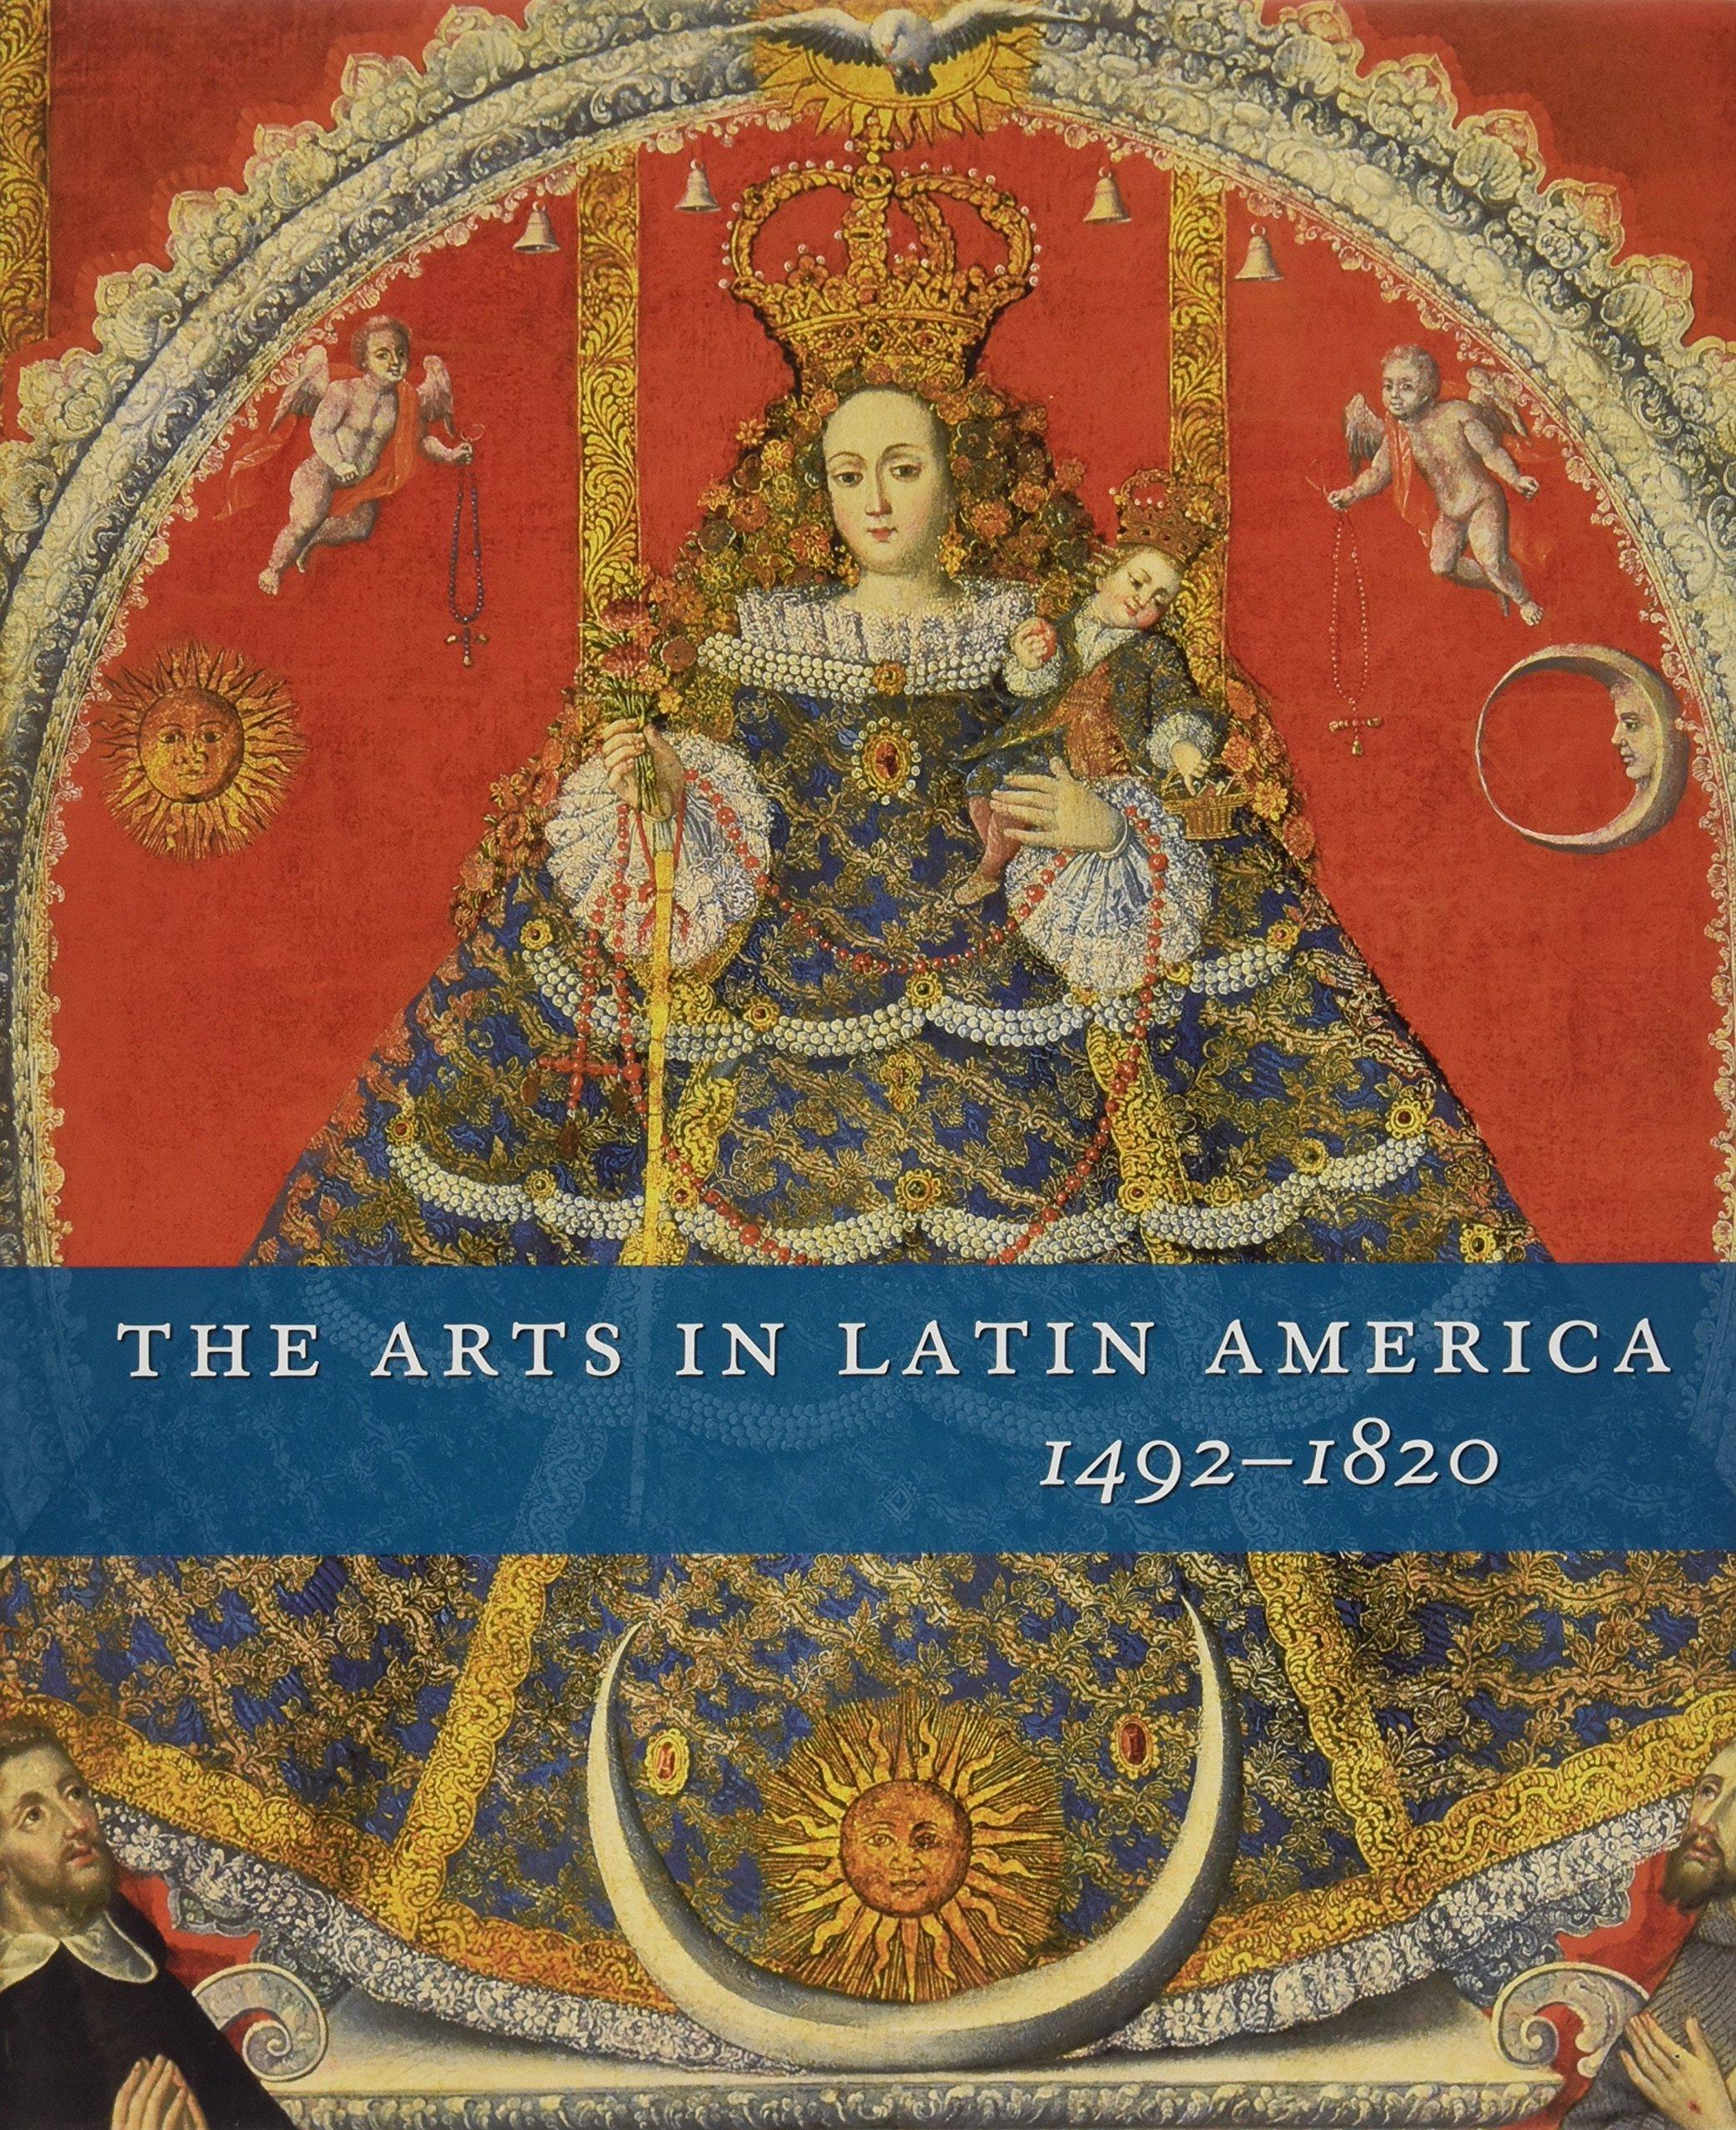 Download The Arts in Latin America, 1492-1820 (Philadelphia Museum of Art) PDF